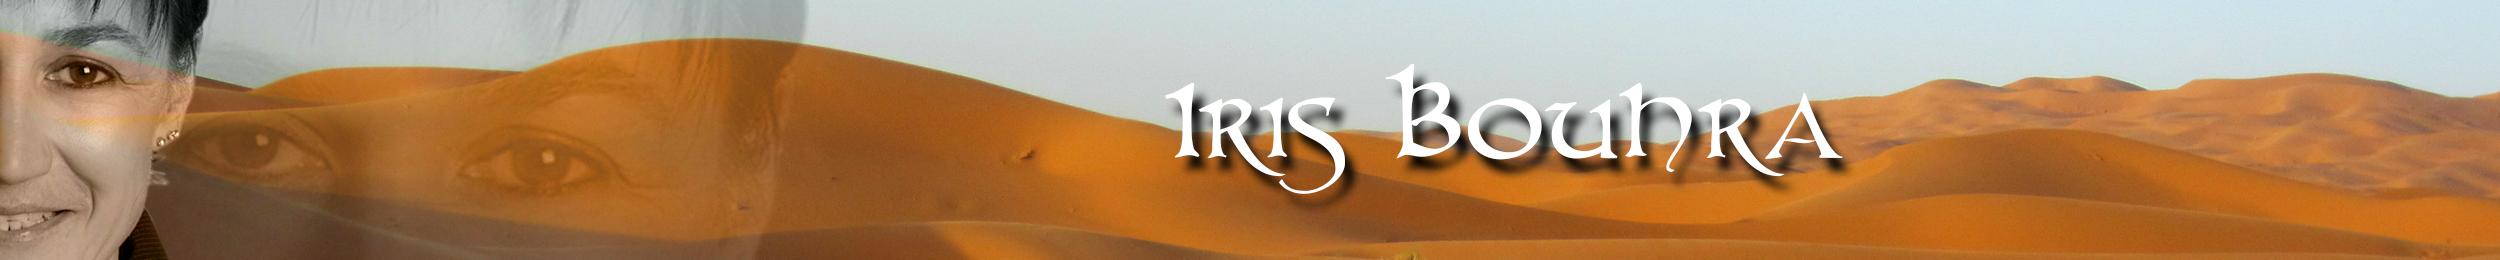 Iris Bouhra -Freie Autorin